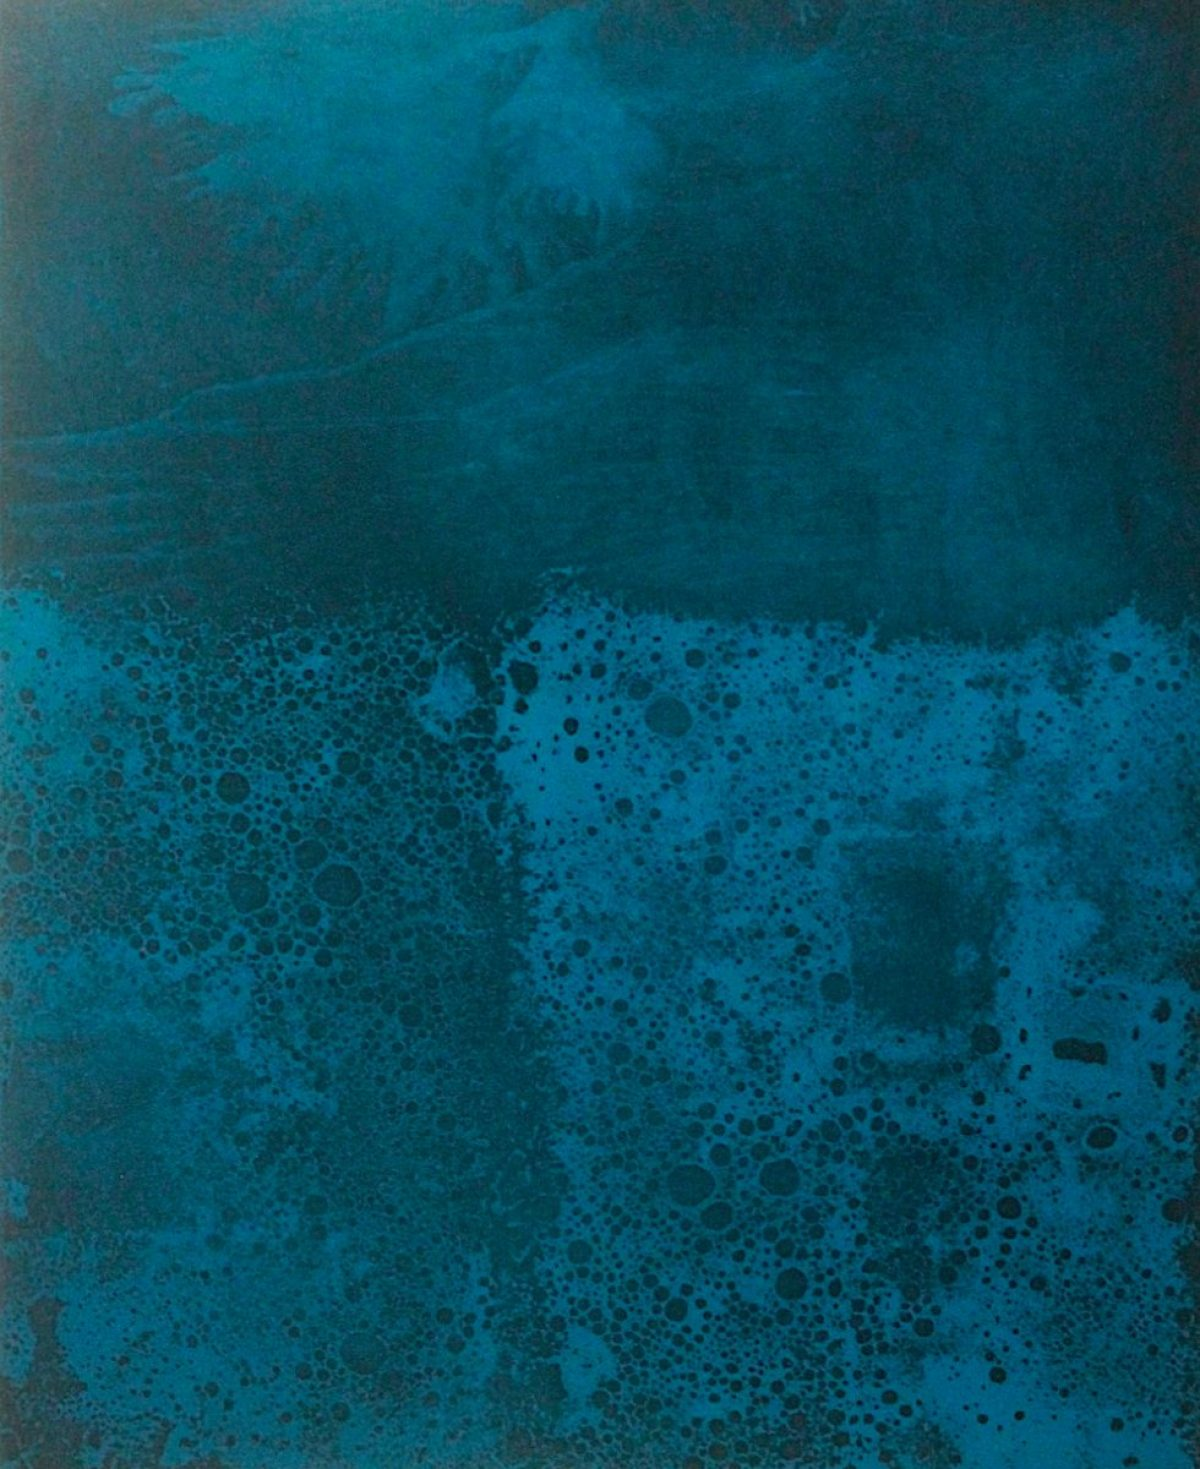 Mateja Šmic: Lode, 46 x 38cm, etching | Diamond Point | Saturday 12 December 2020  – Saturday 16 January 2021 | Graphic Studio Gallery